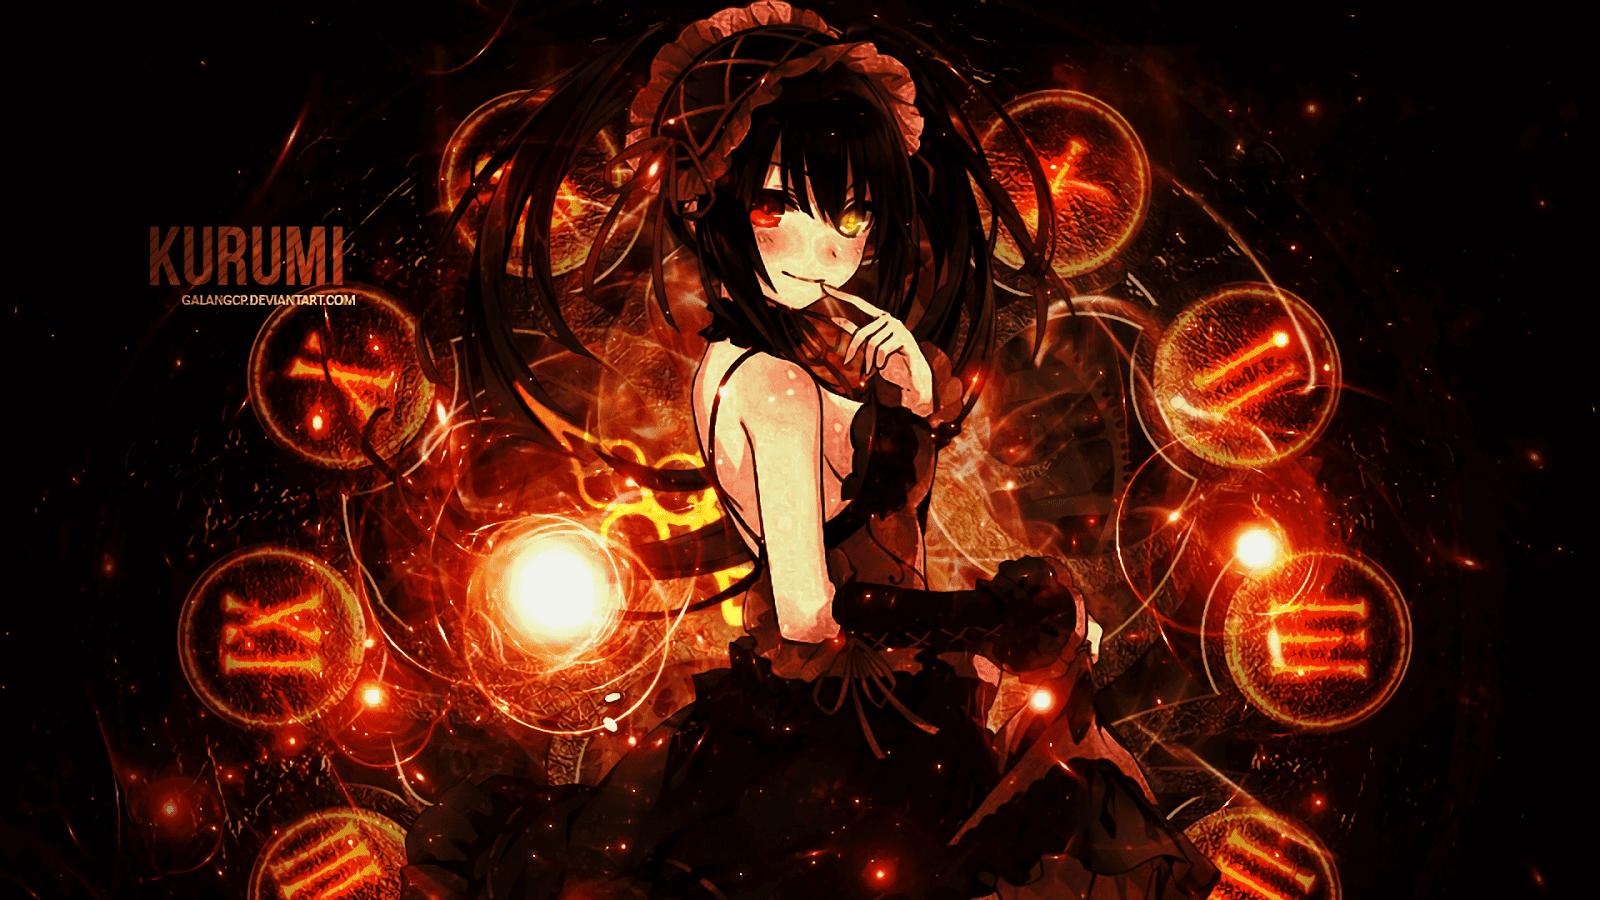 Pc Kurumi Tokisaki Gadis Anime Seni Anime Gadis Animasi